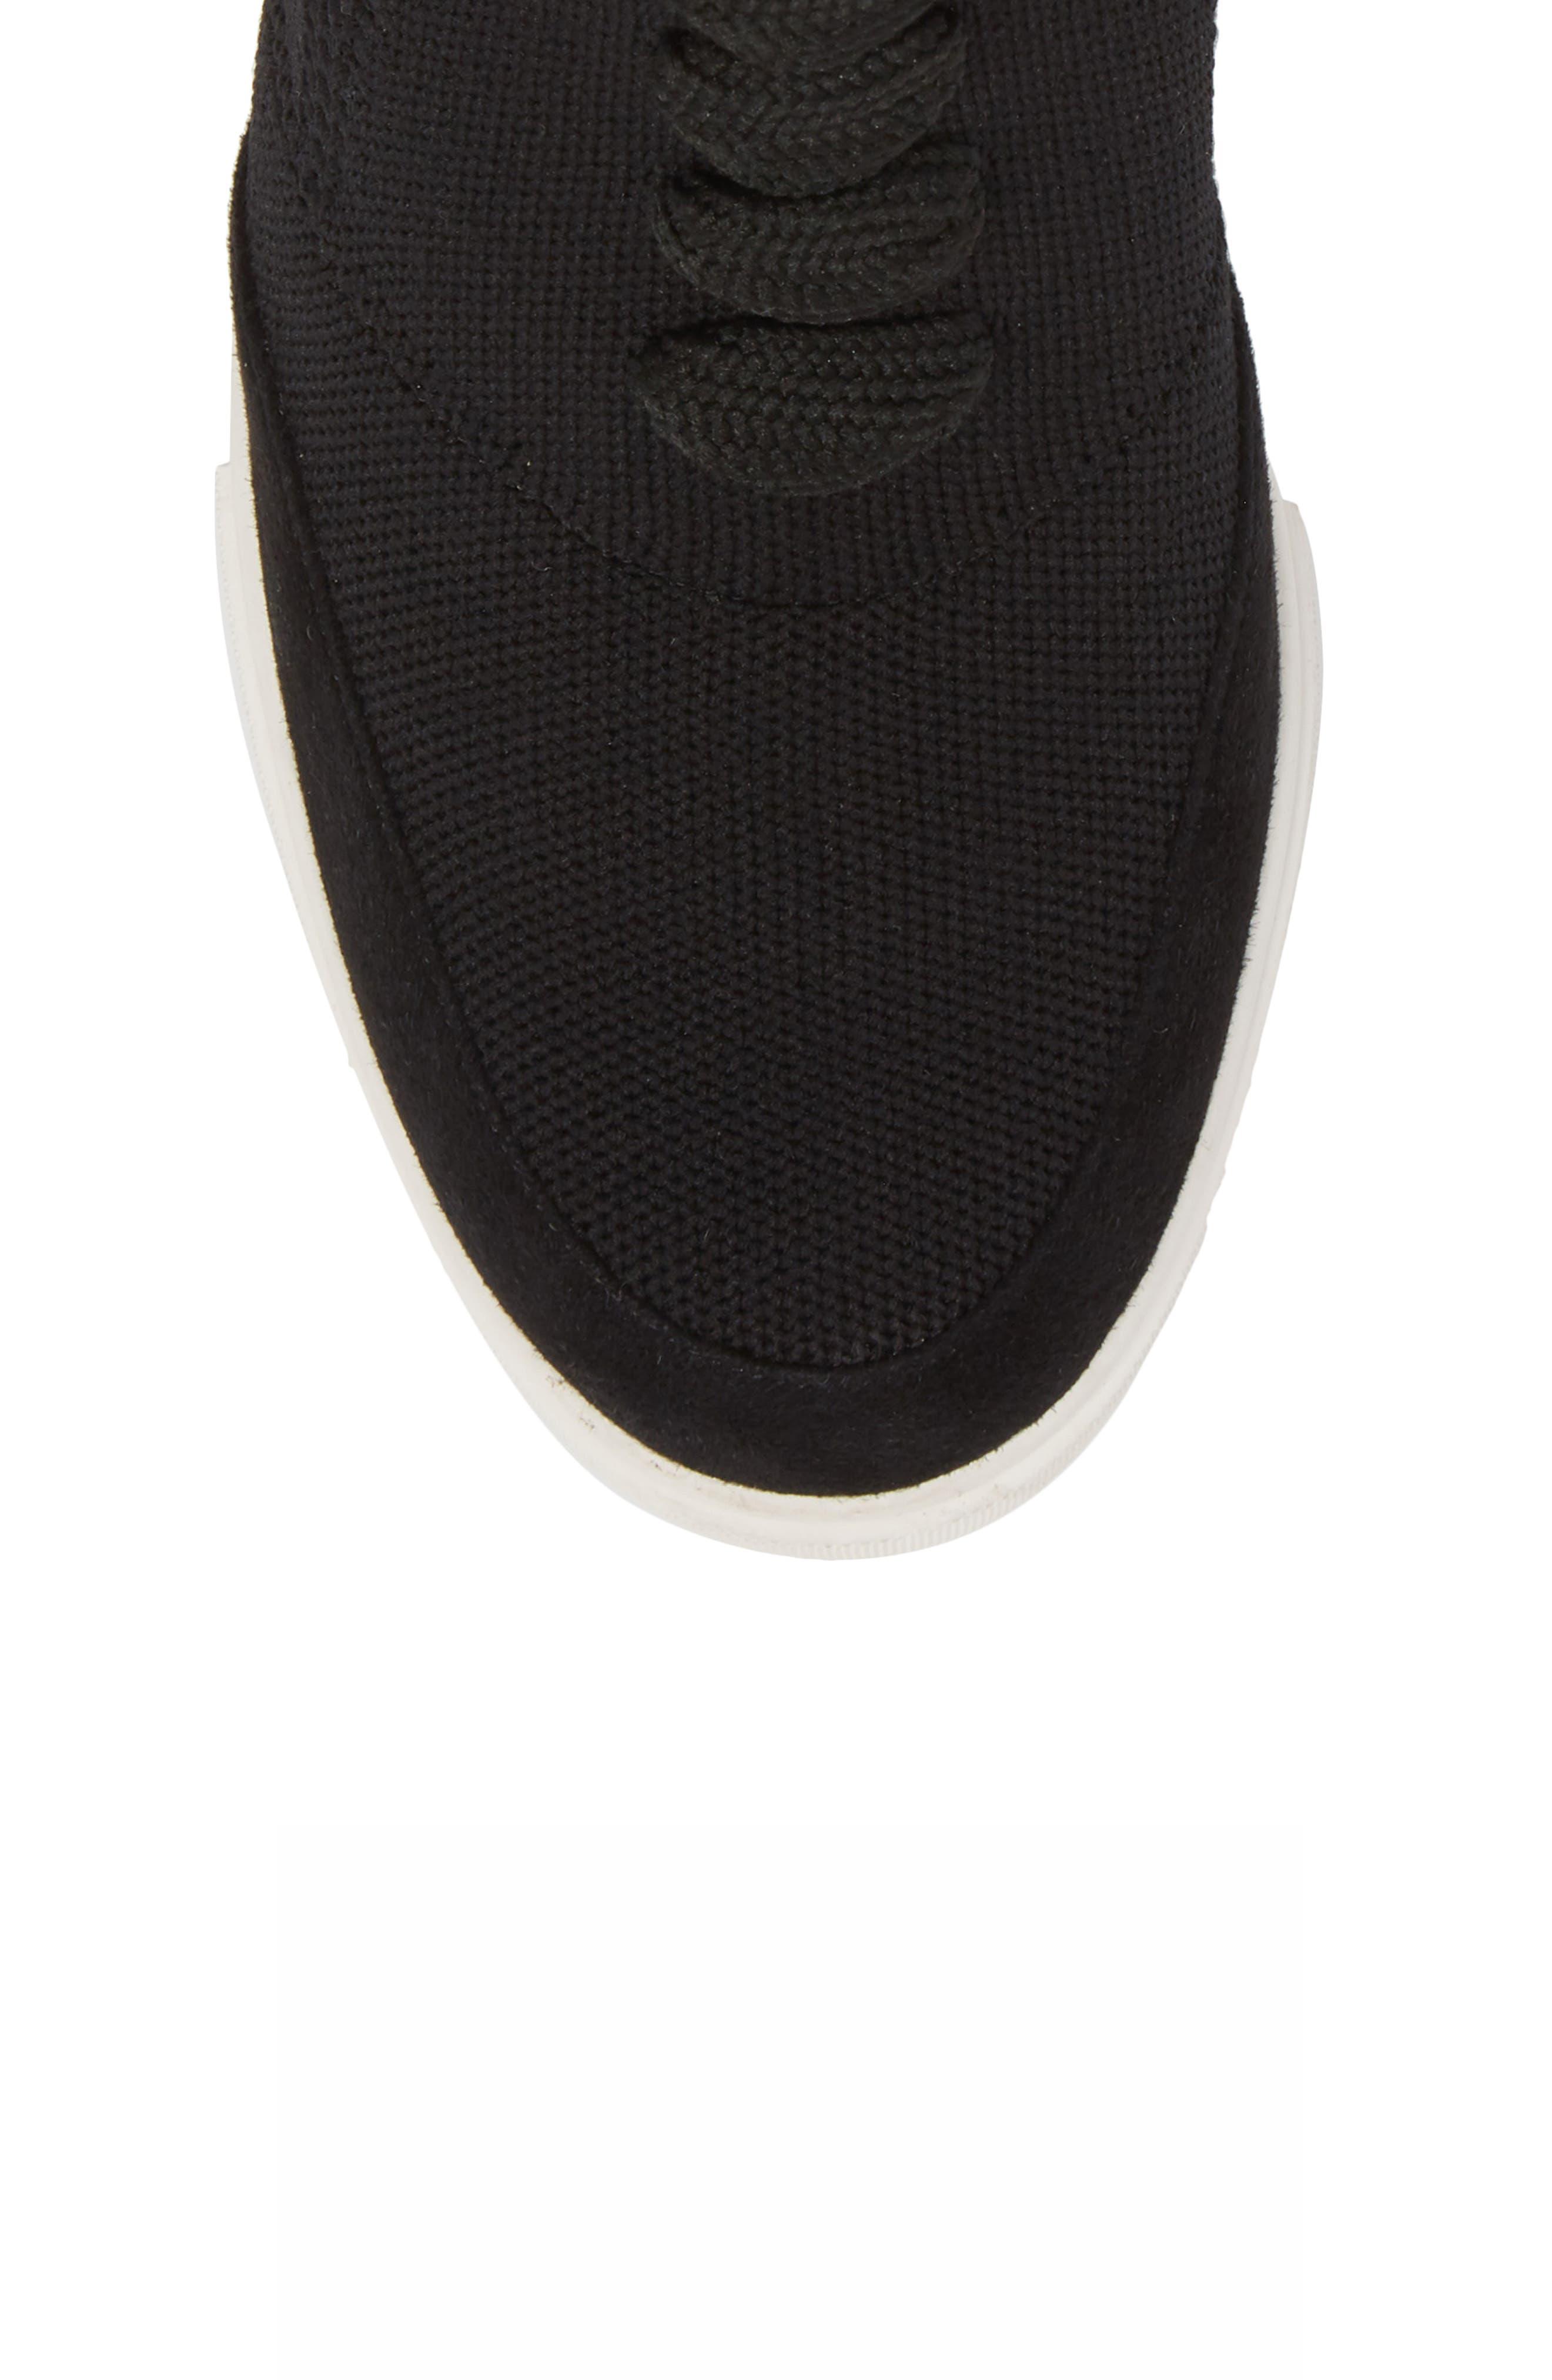 LINEA PAOLO,                             Fabiana Wedge Sneaker,                             Alternate thumbnail 5, color,                             BLACK SUEDE